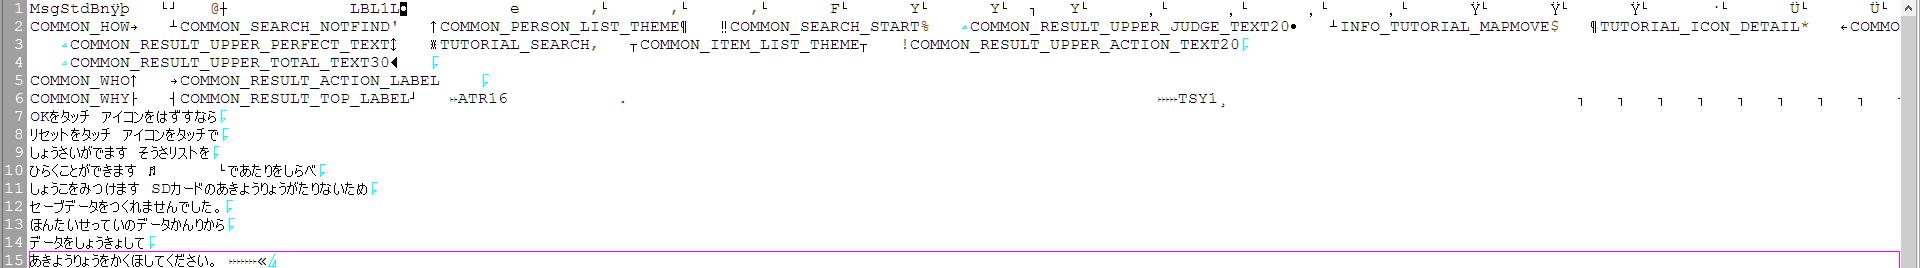 Rebuild Cxi File